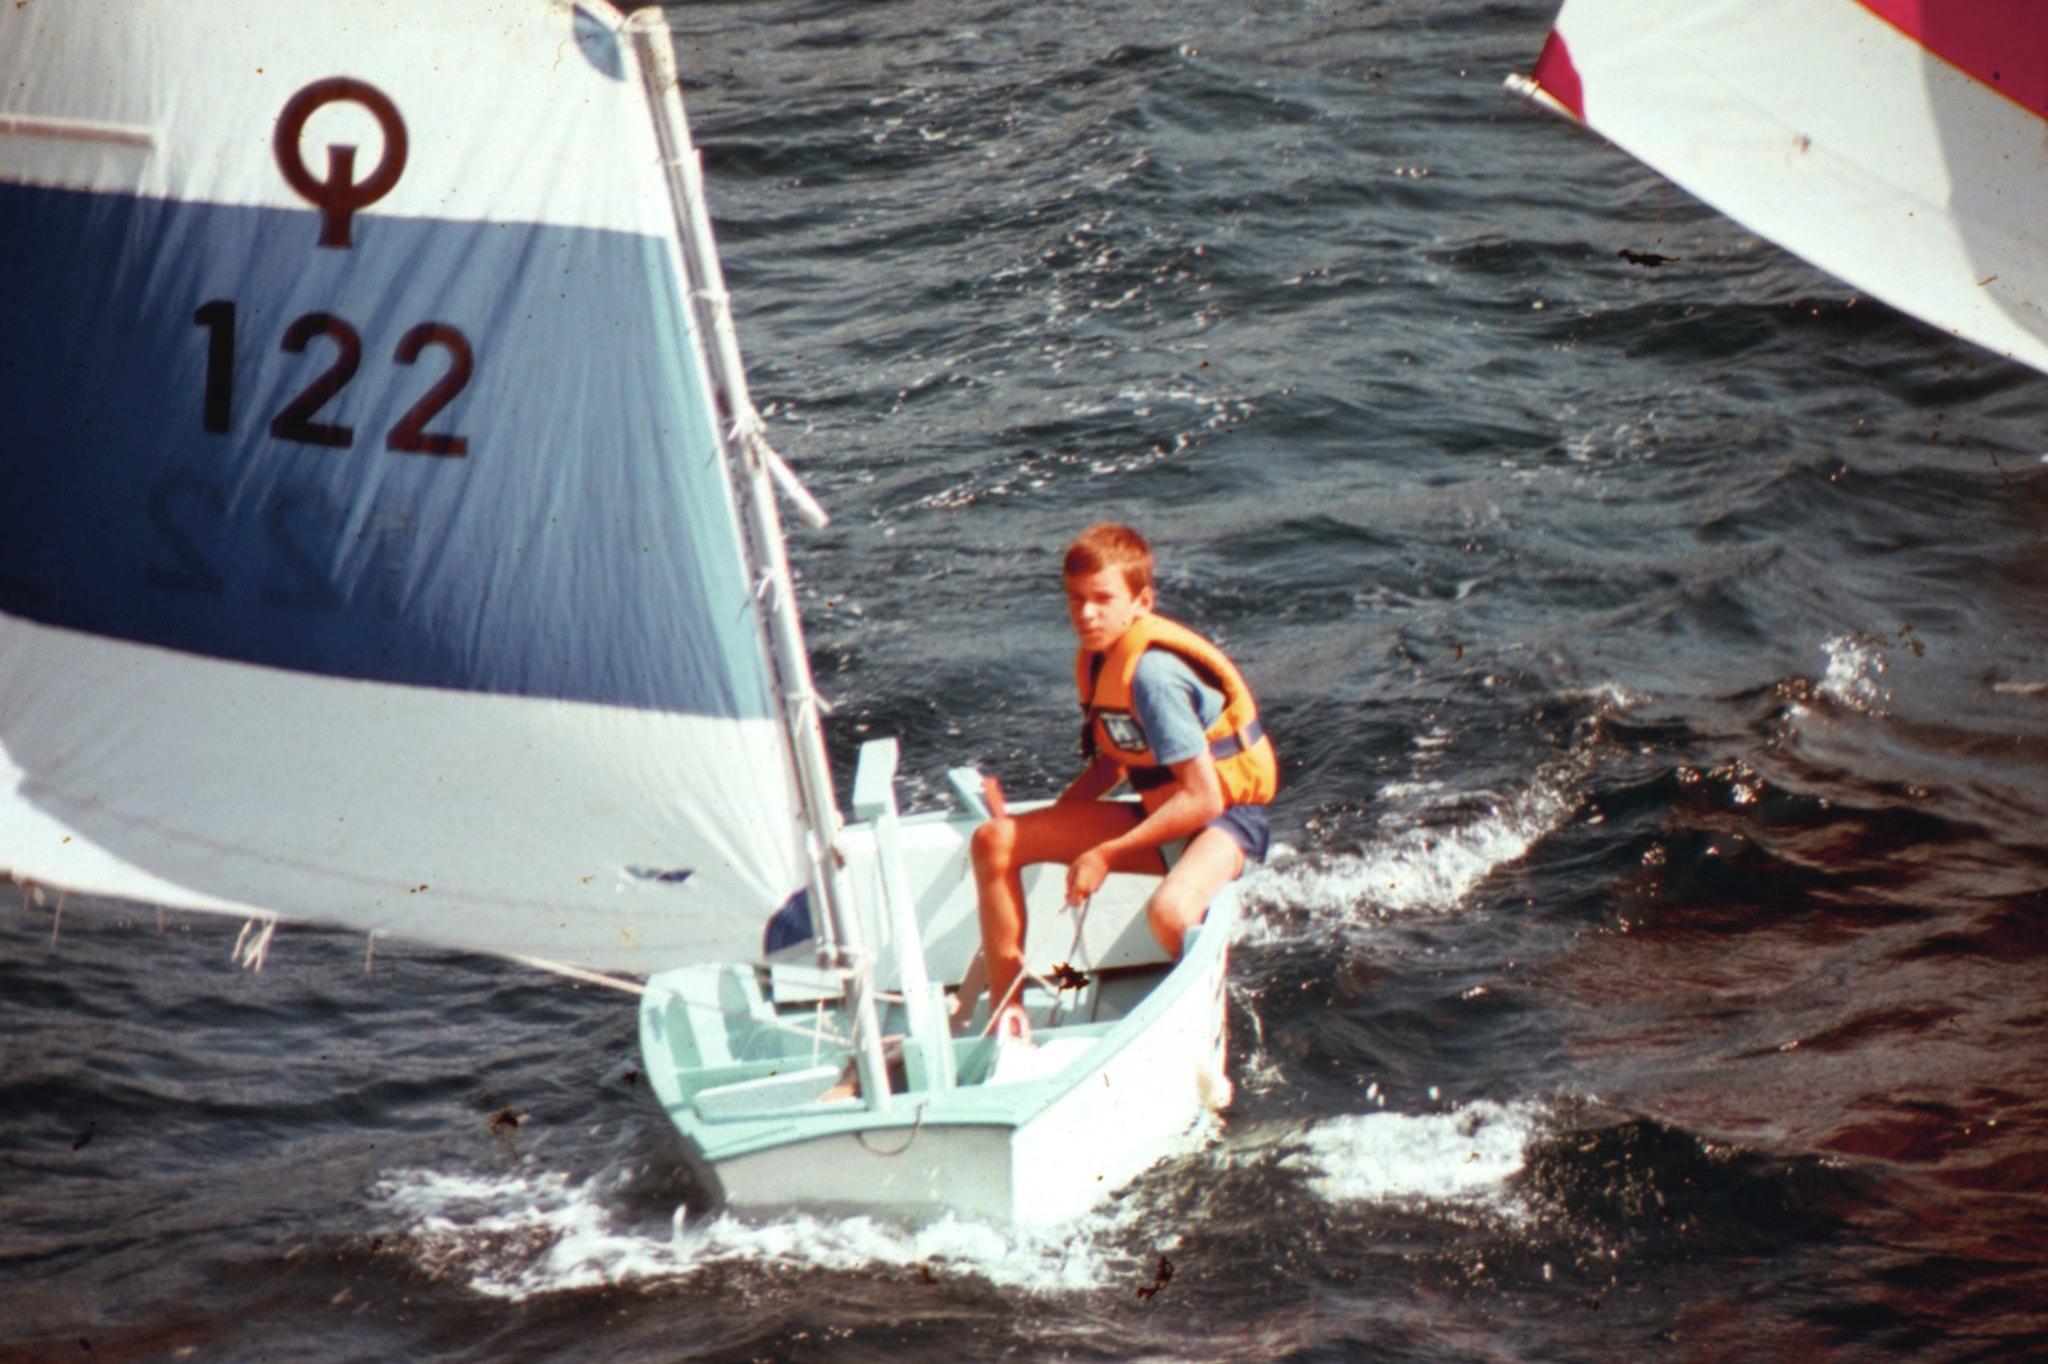 Teenage boy in sailboat